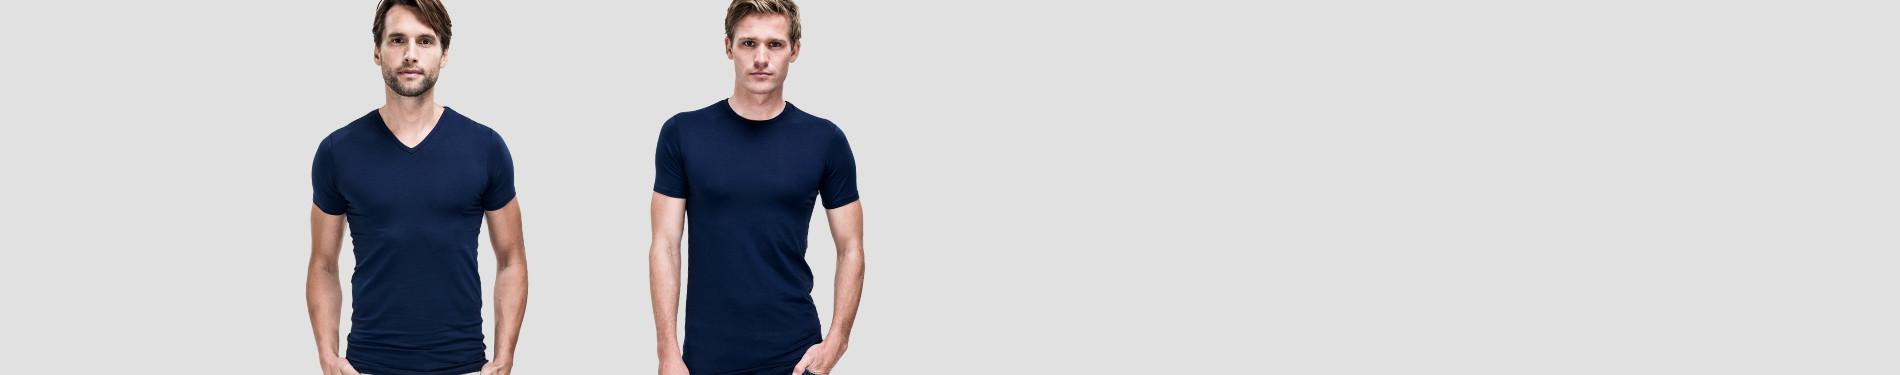 Blauwe T-shirts